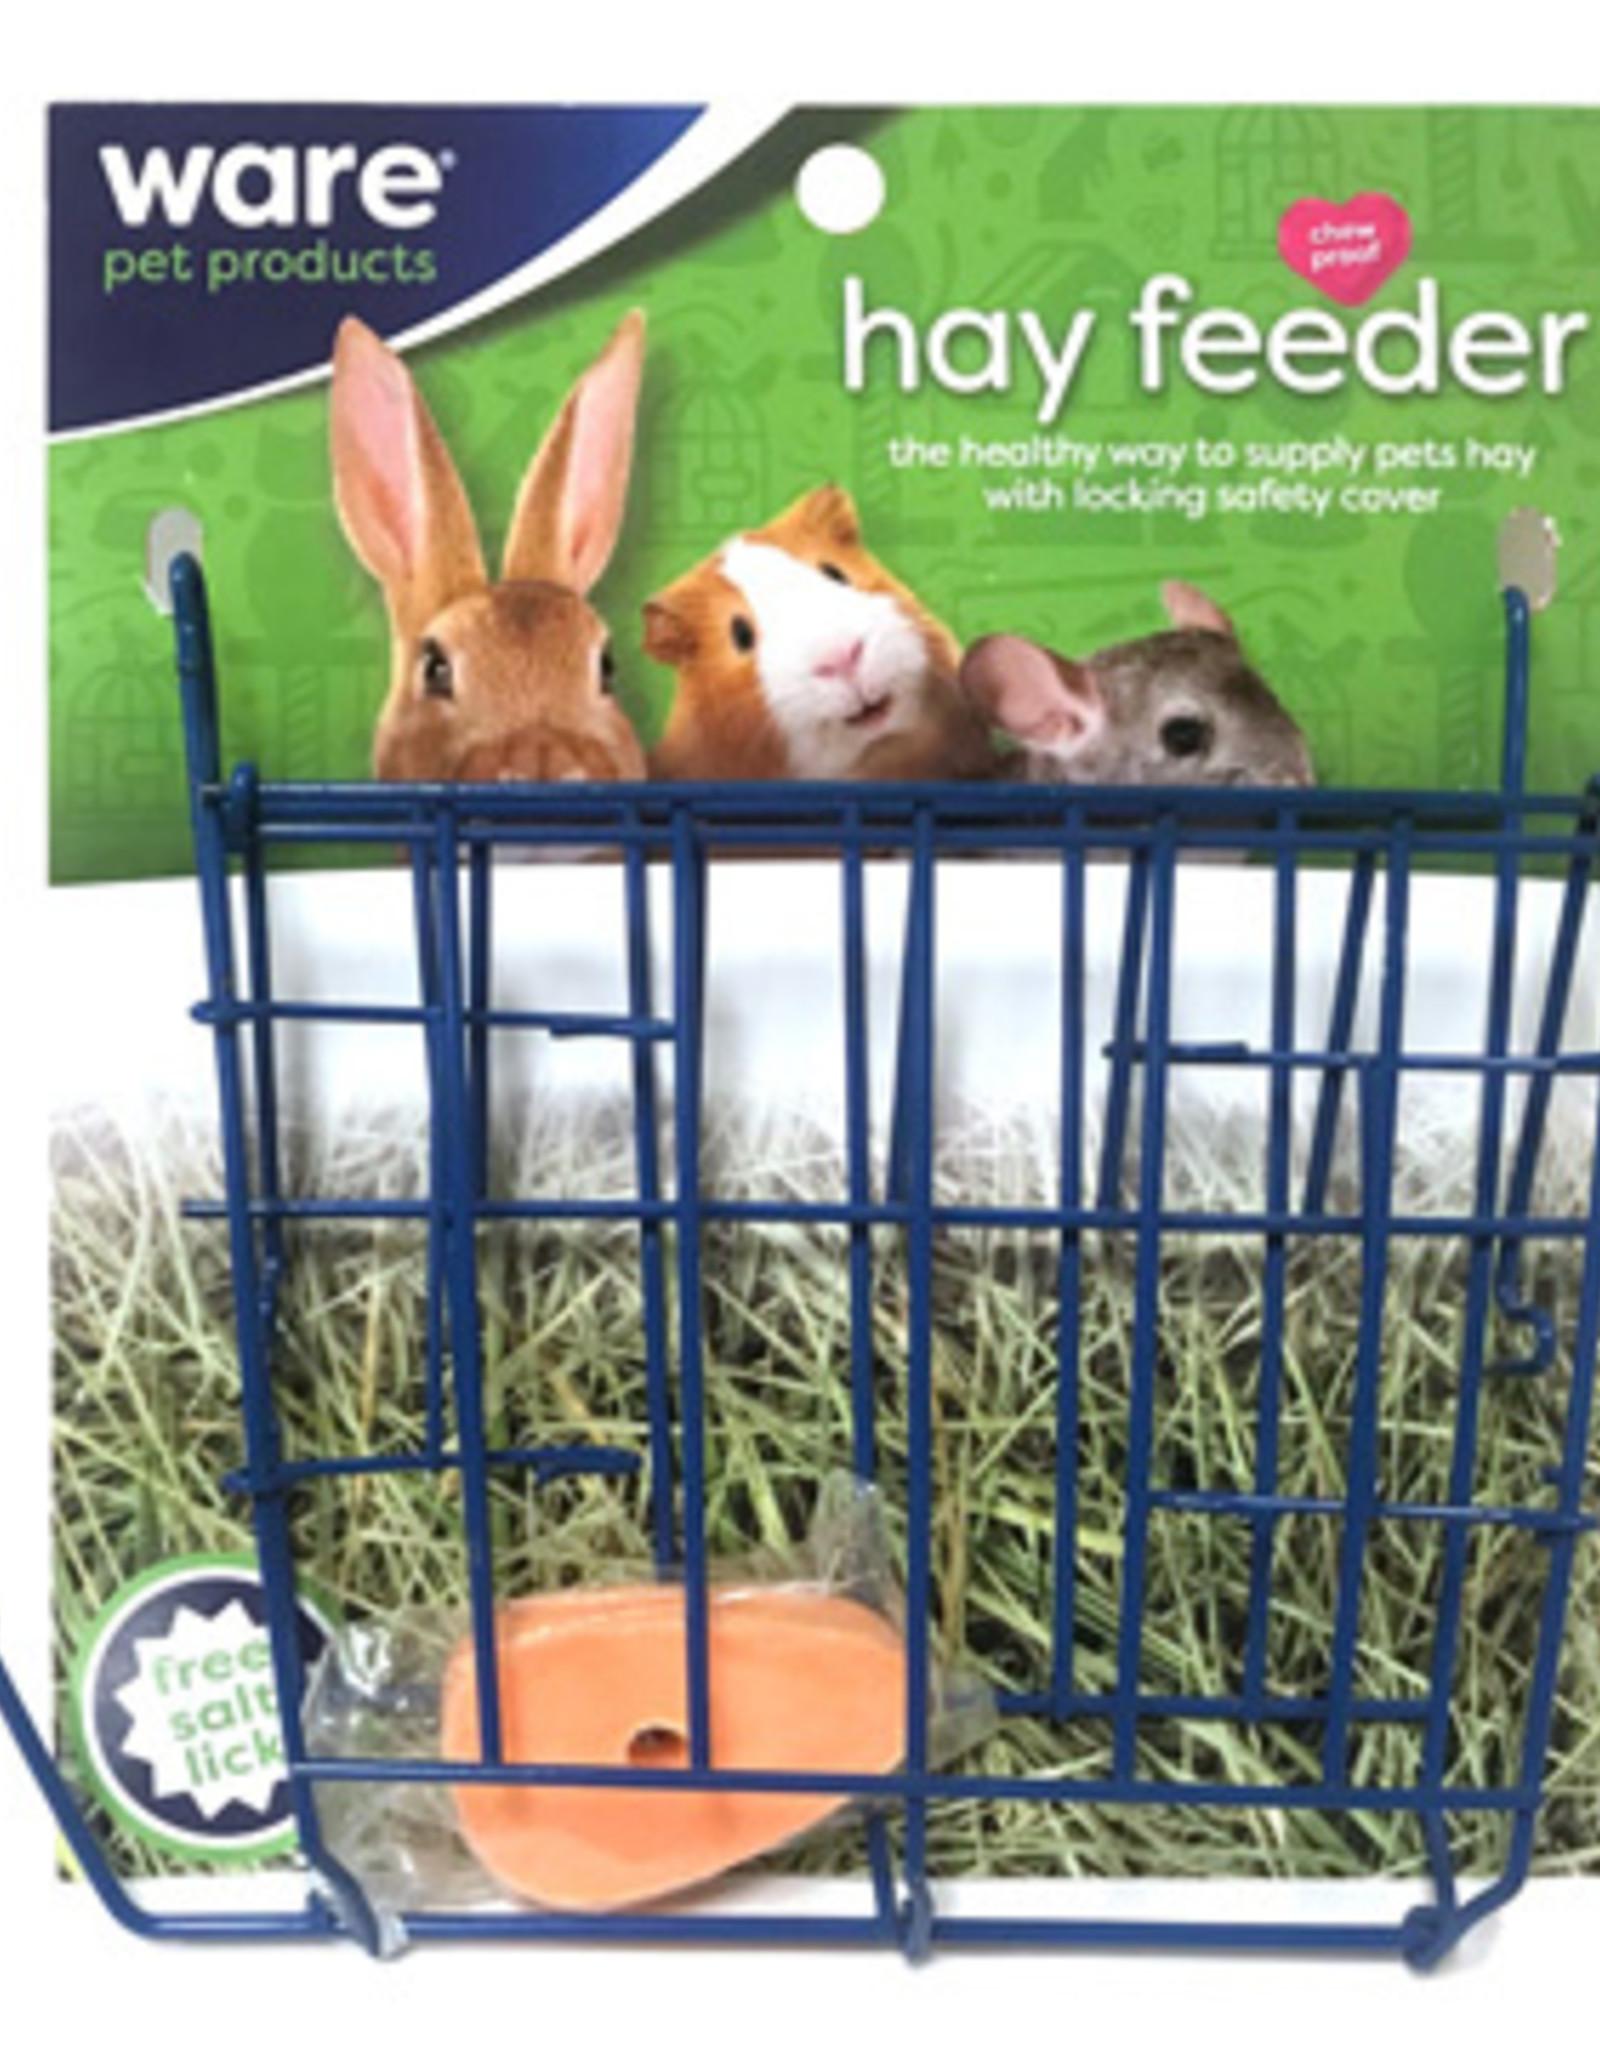 Ware Hay Feeder with Salt Lick